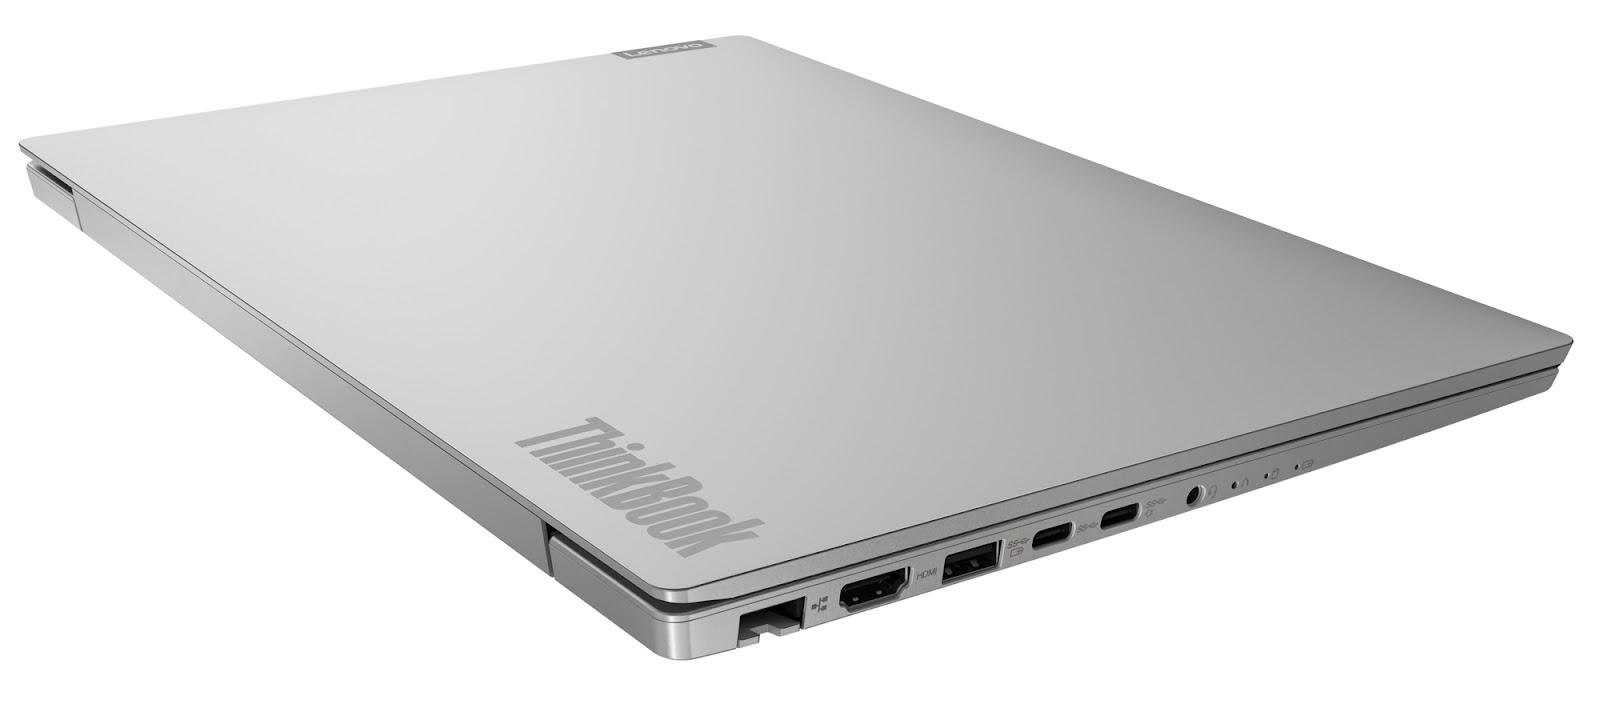 Фото 3. Ноутбук Lenovo ThinkBook 14 IIL (20SL00F5RU)